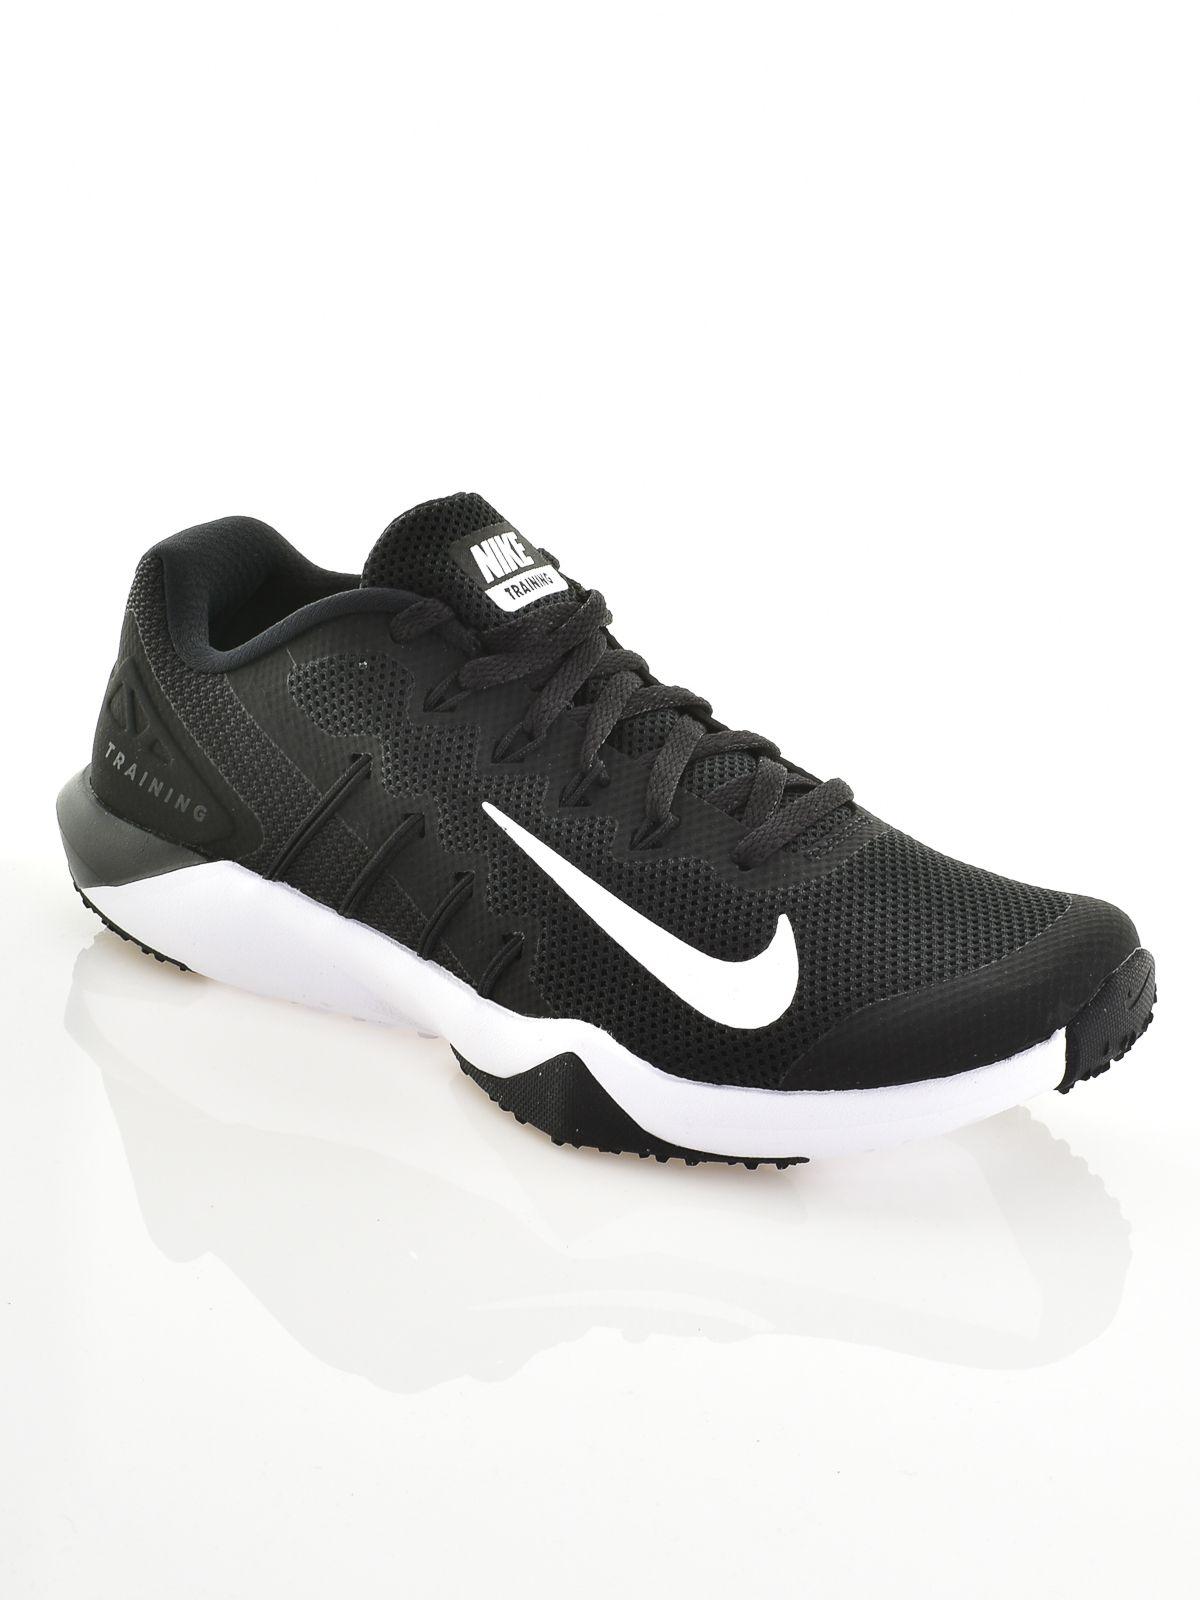 Olcsó Nike Zoom Train Action Cipő Férfi Fekete Kék Fehér